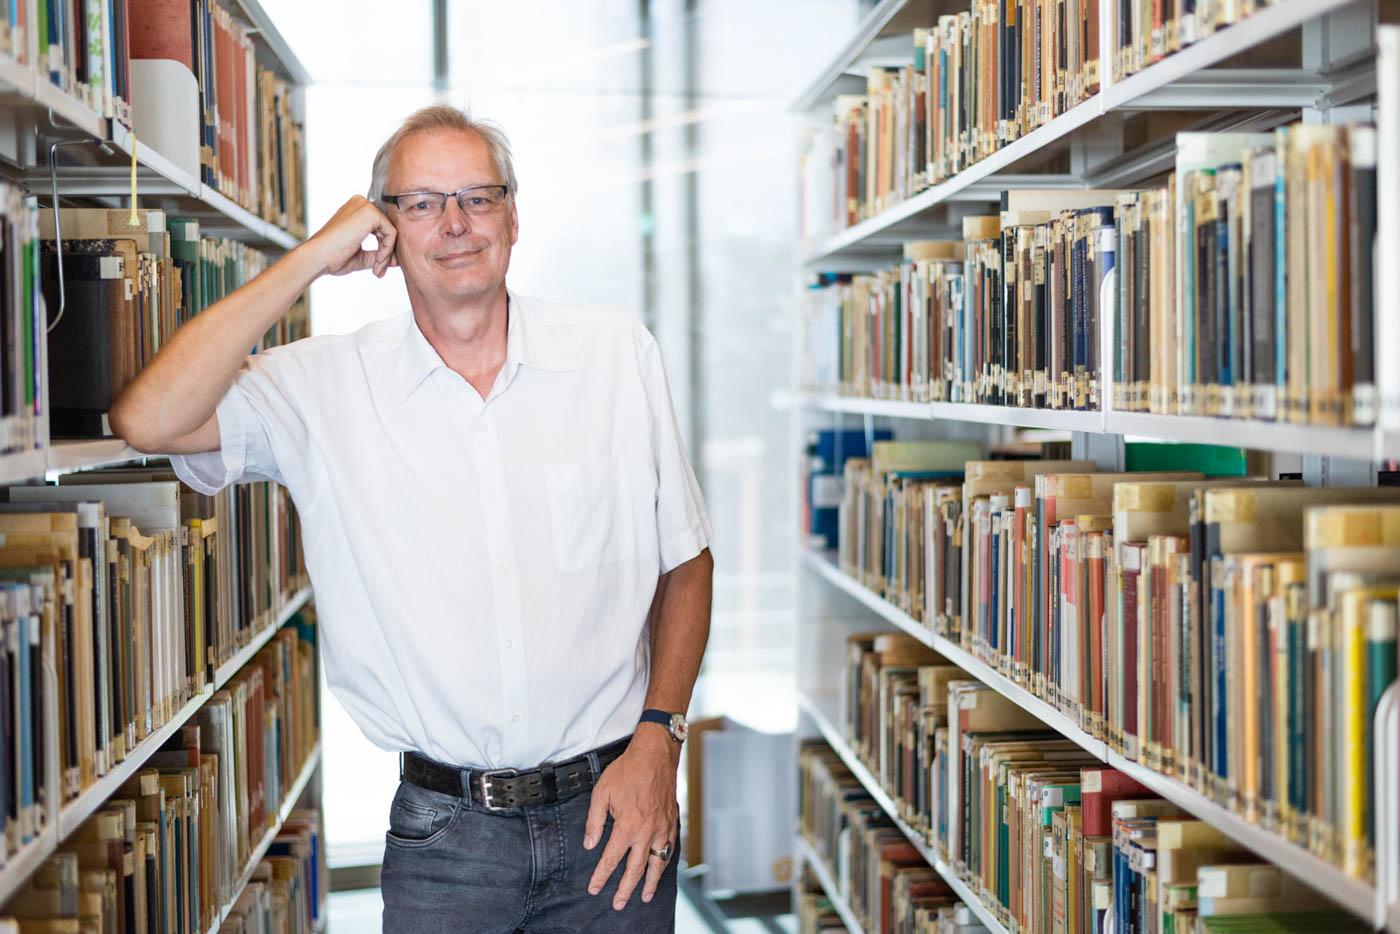 Herr Neumärker lehnt an Buchregal und lächelt